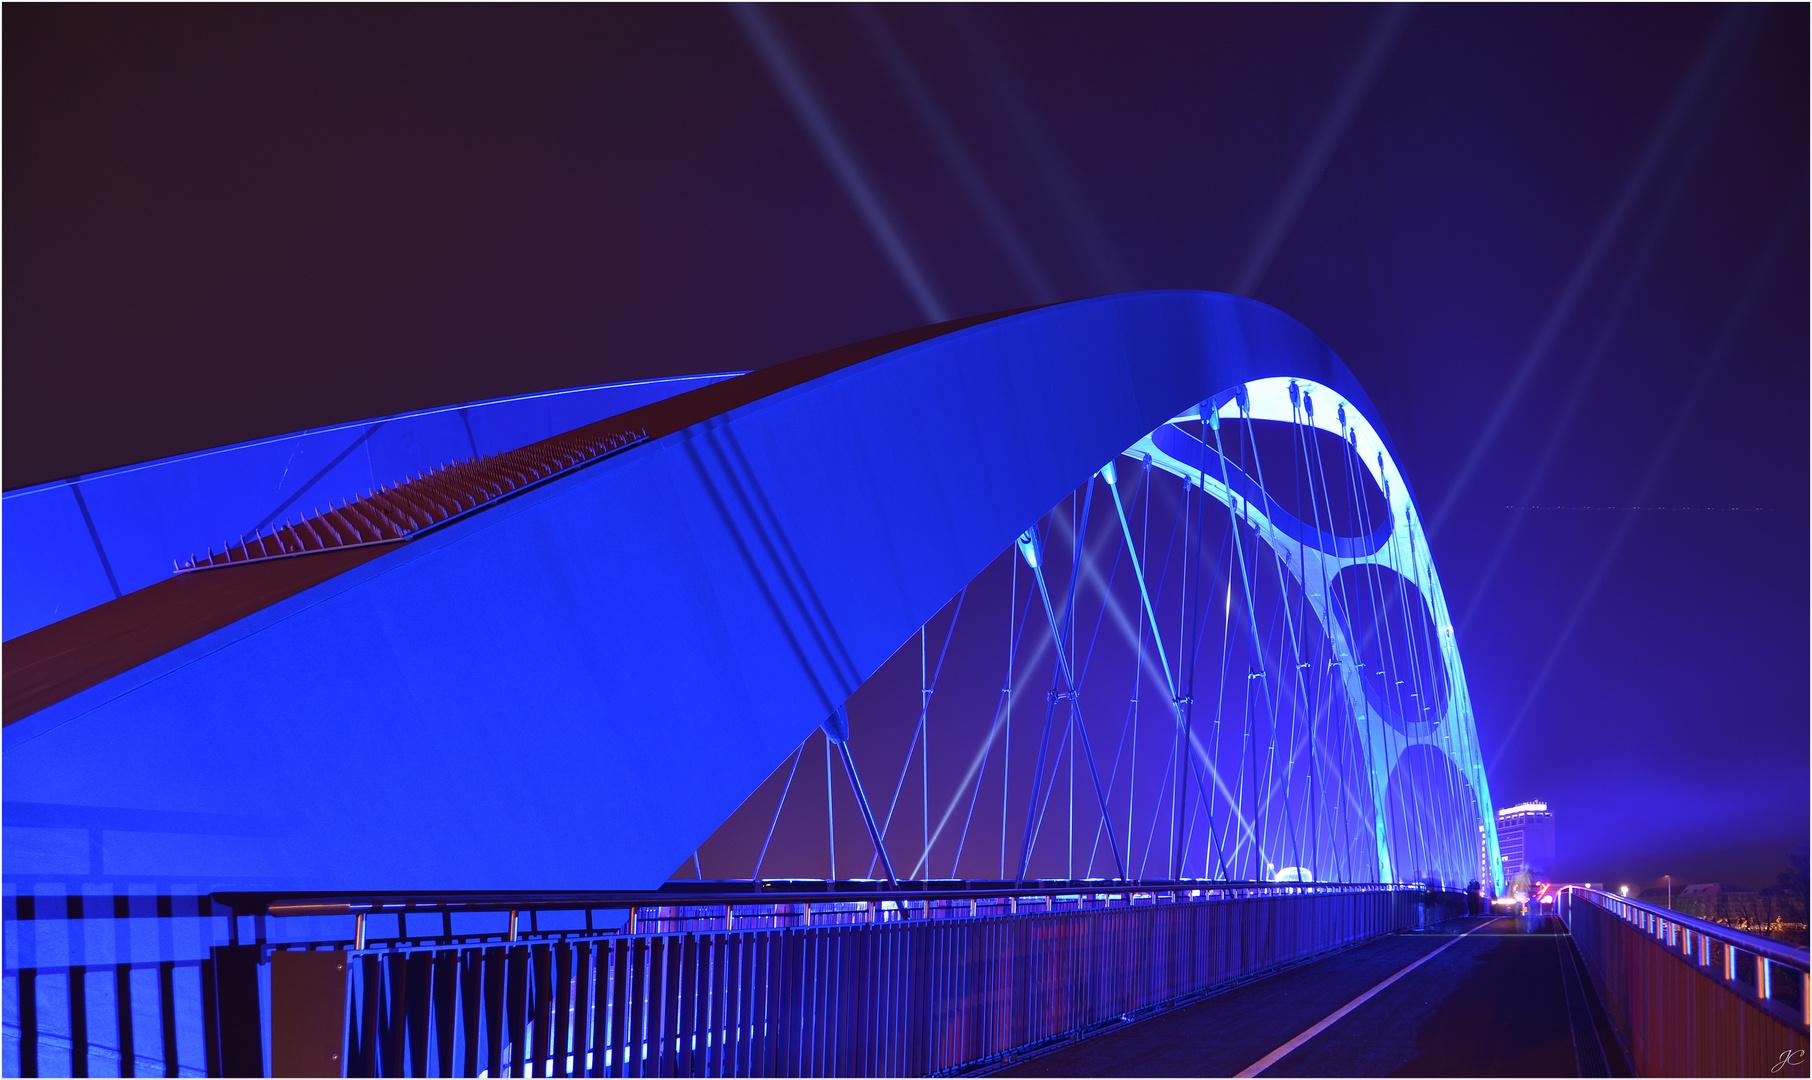 Die Osthafenbrücke I